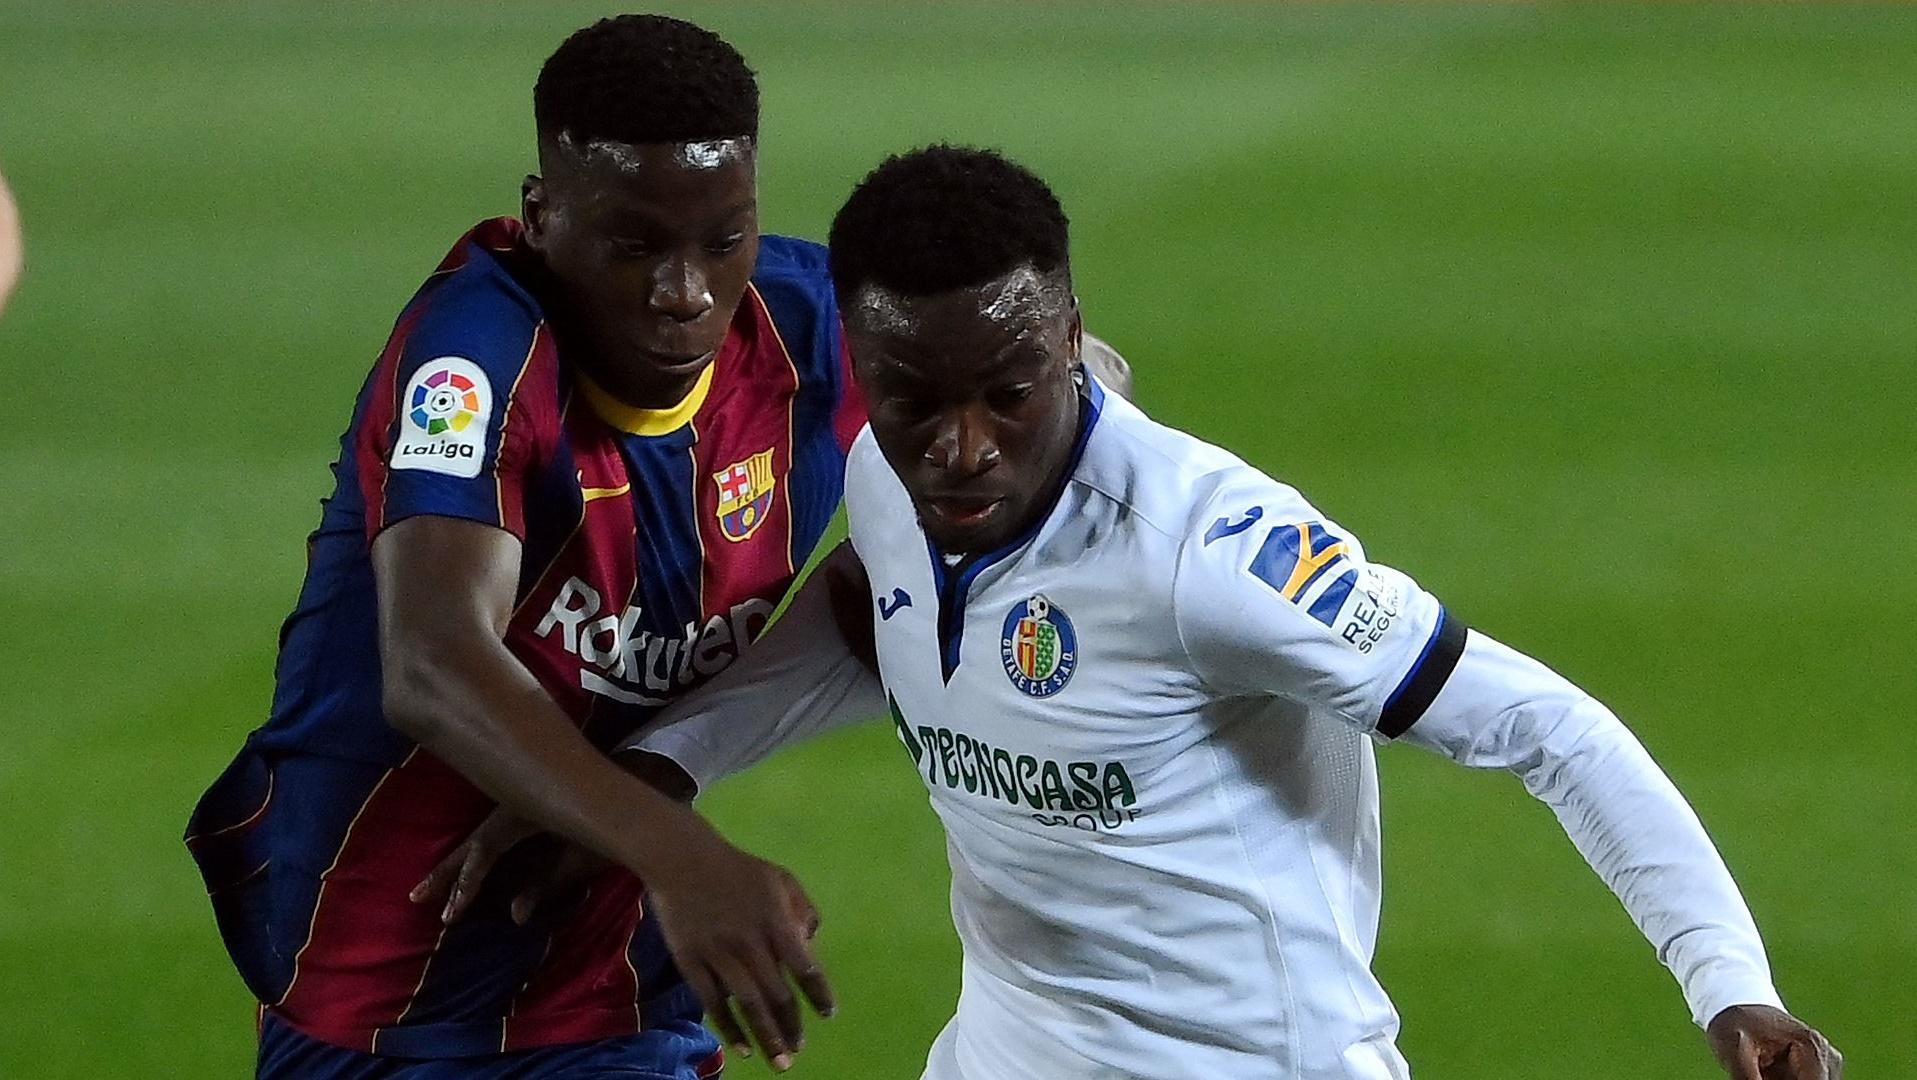 Spain-based duo Sabit and Obeng join Ghana U23s for Japan and South Korea friendlies